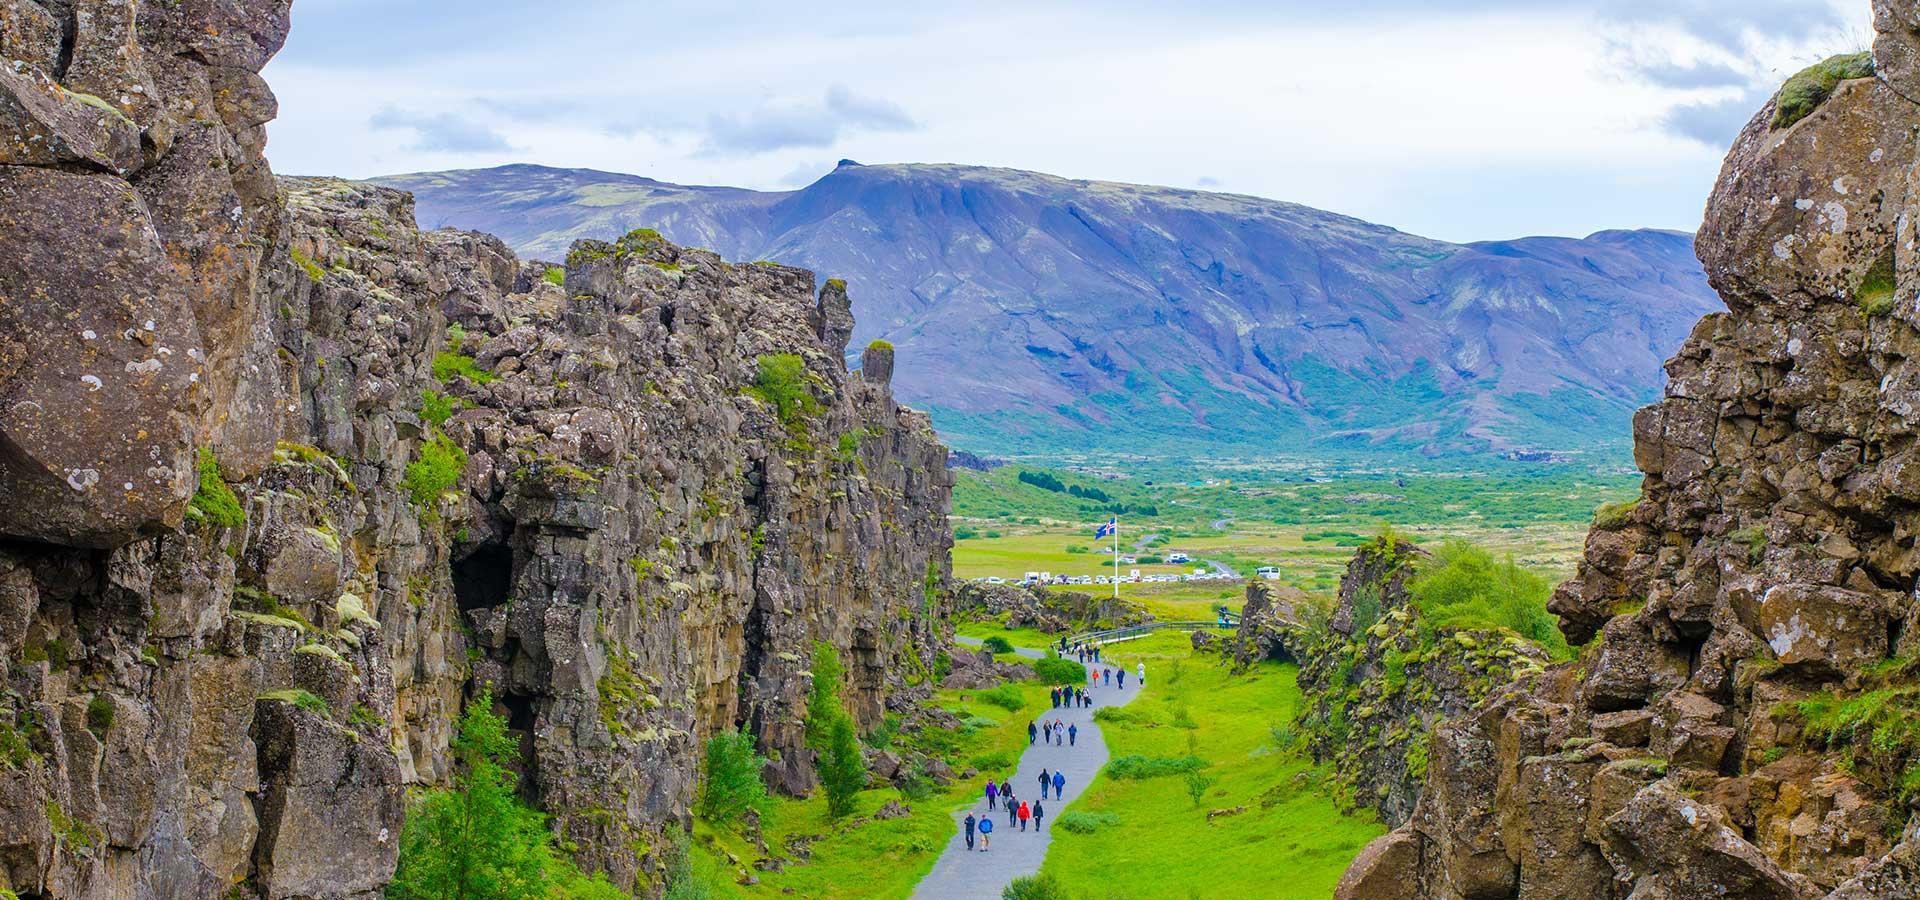 Islande-Parc national-Thingvellir